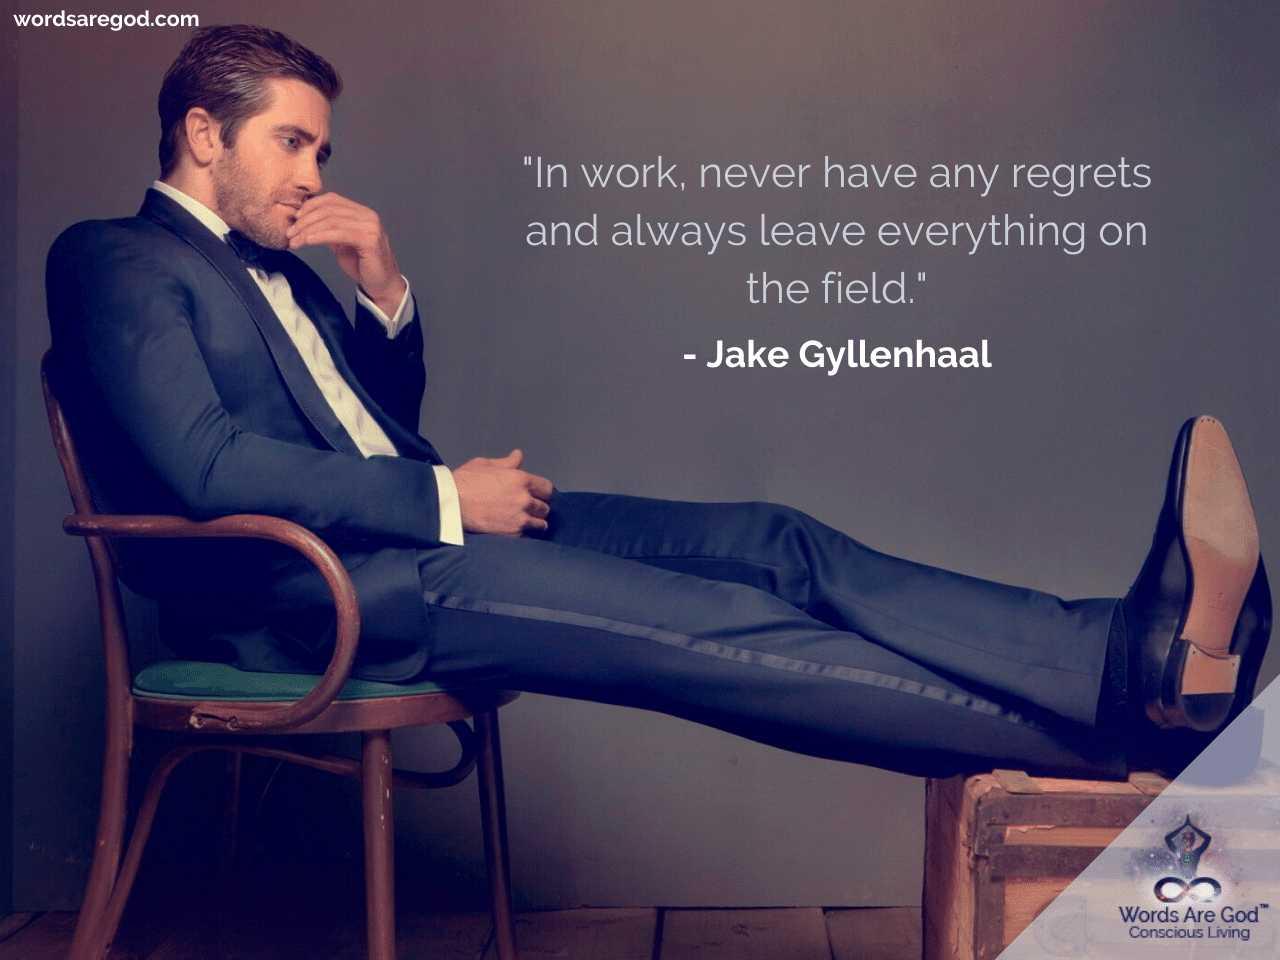 Jake Gyllenhaal Life Quotes